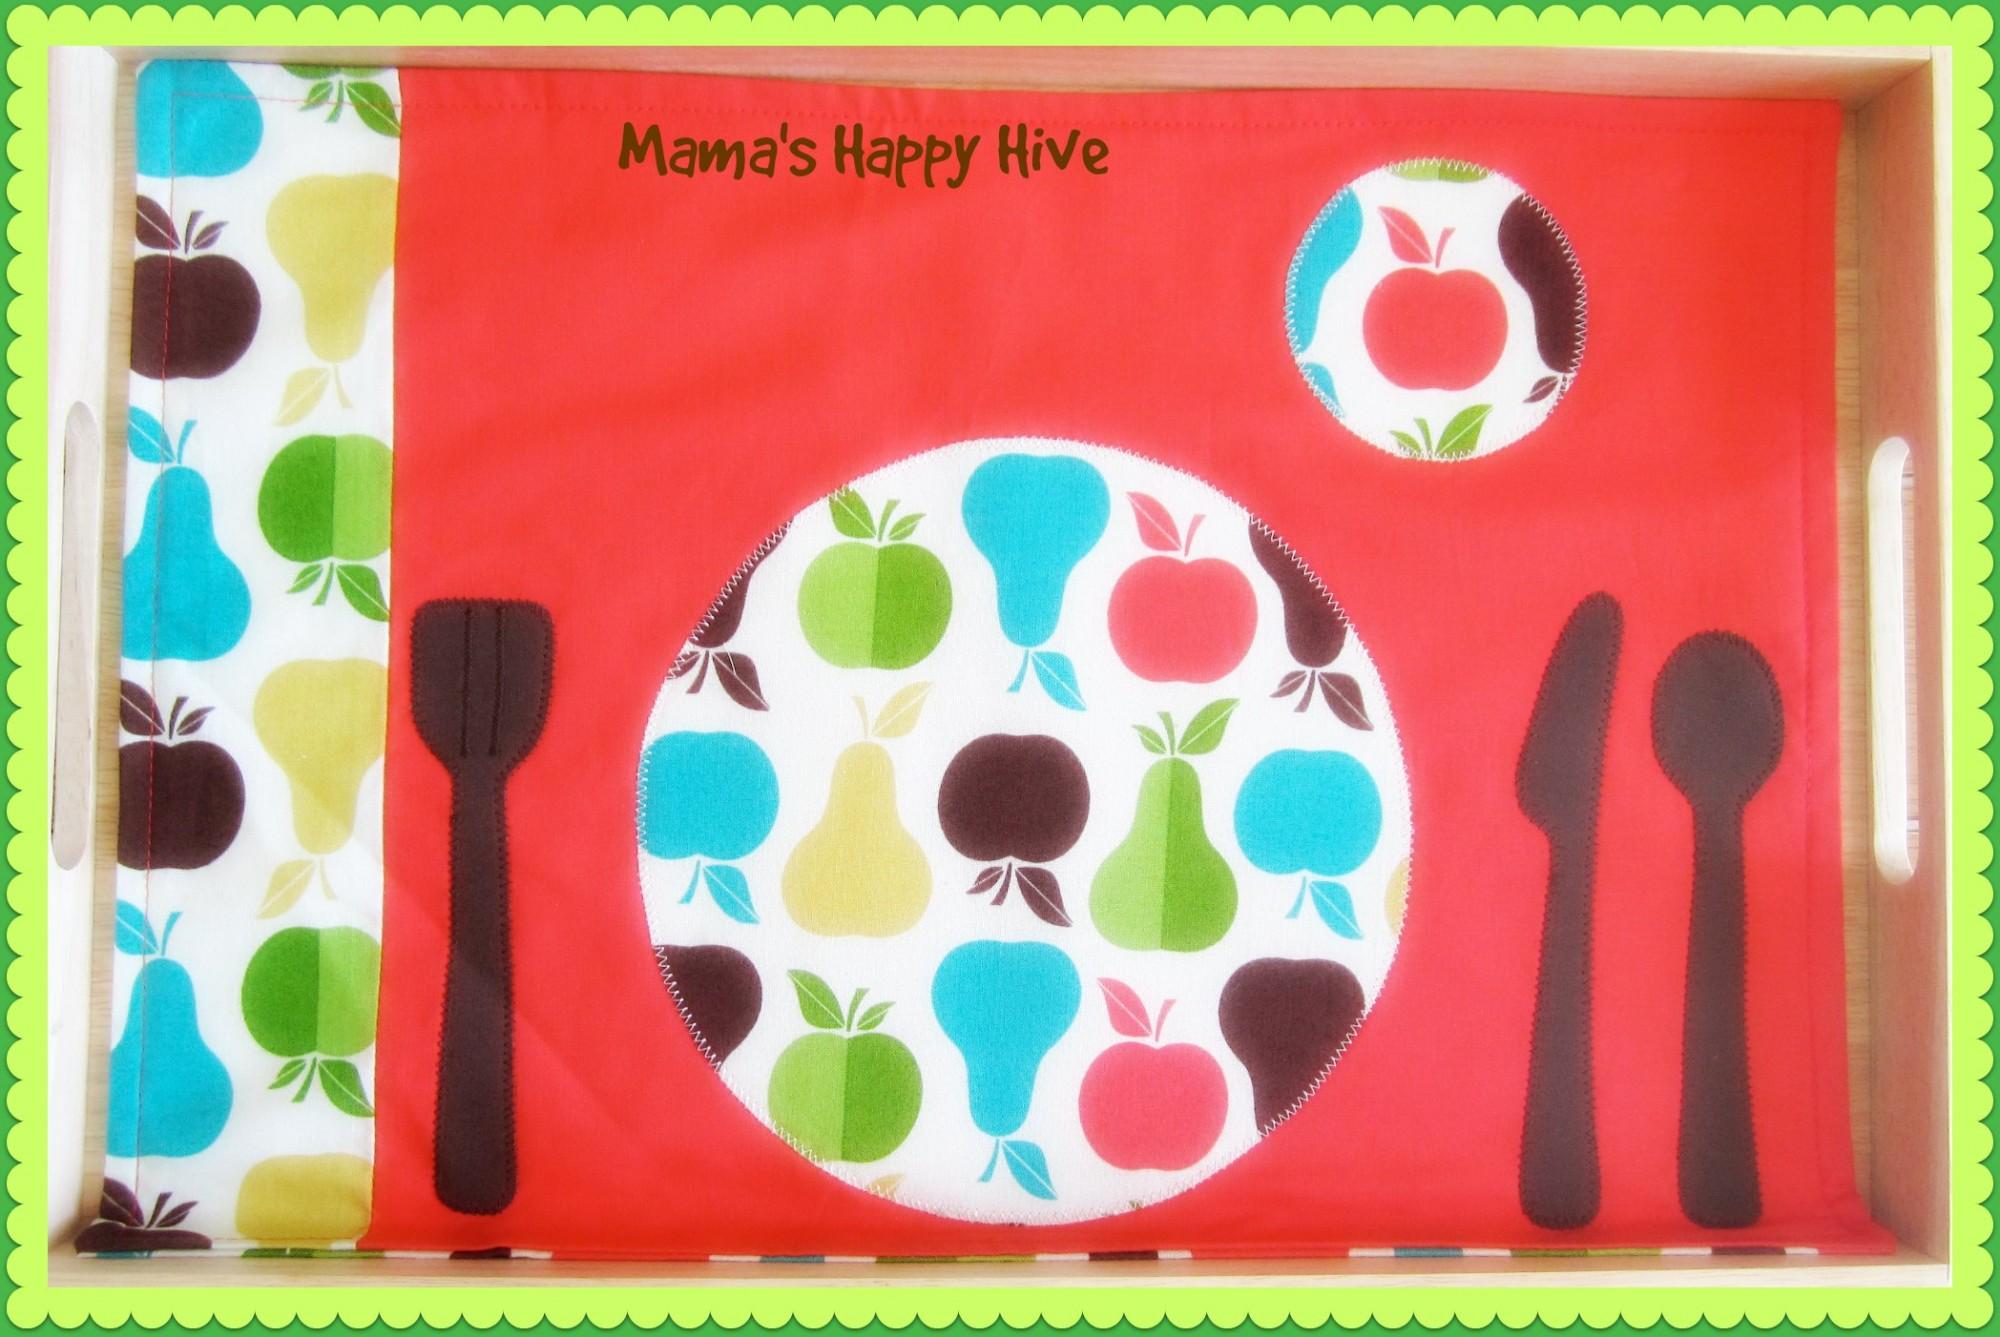 Montessori Placemat - www.mamashappyhive.com